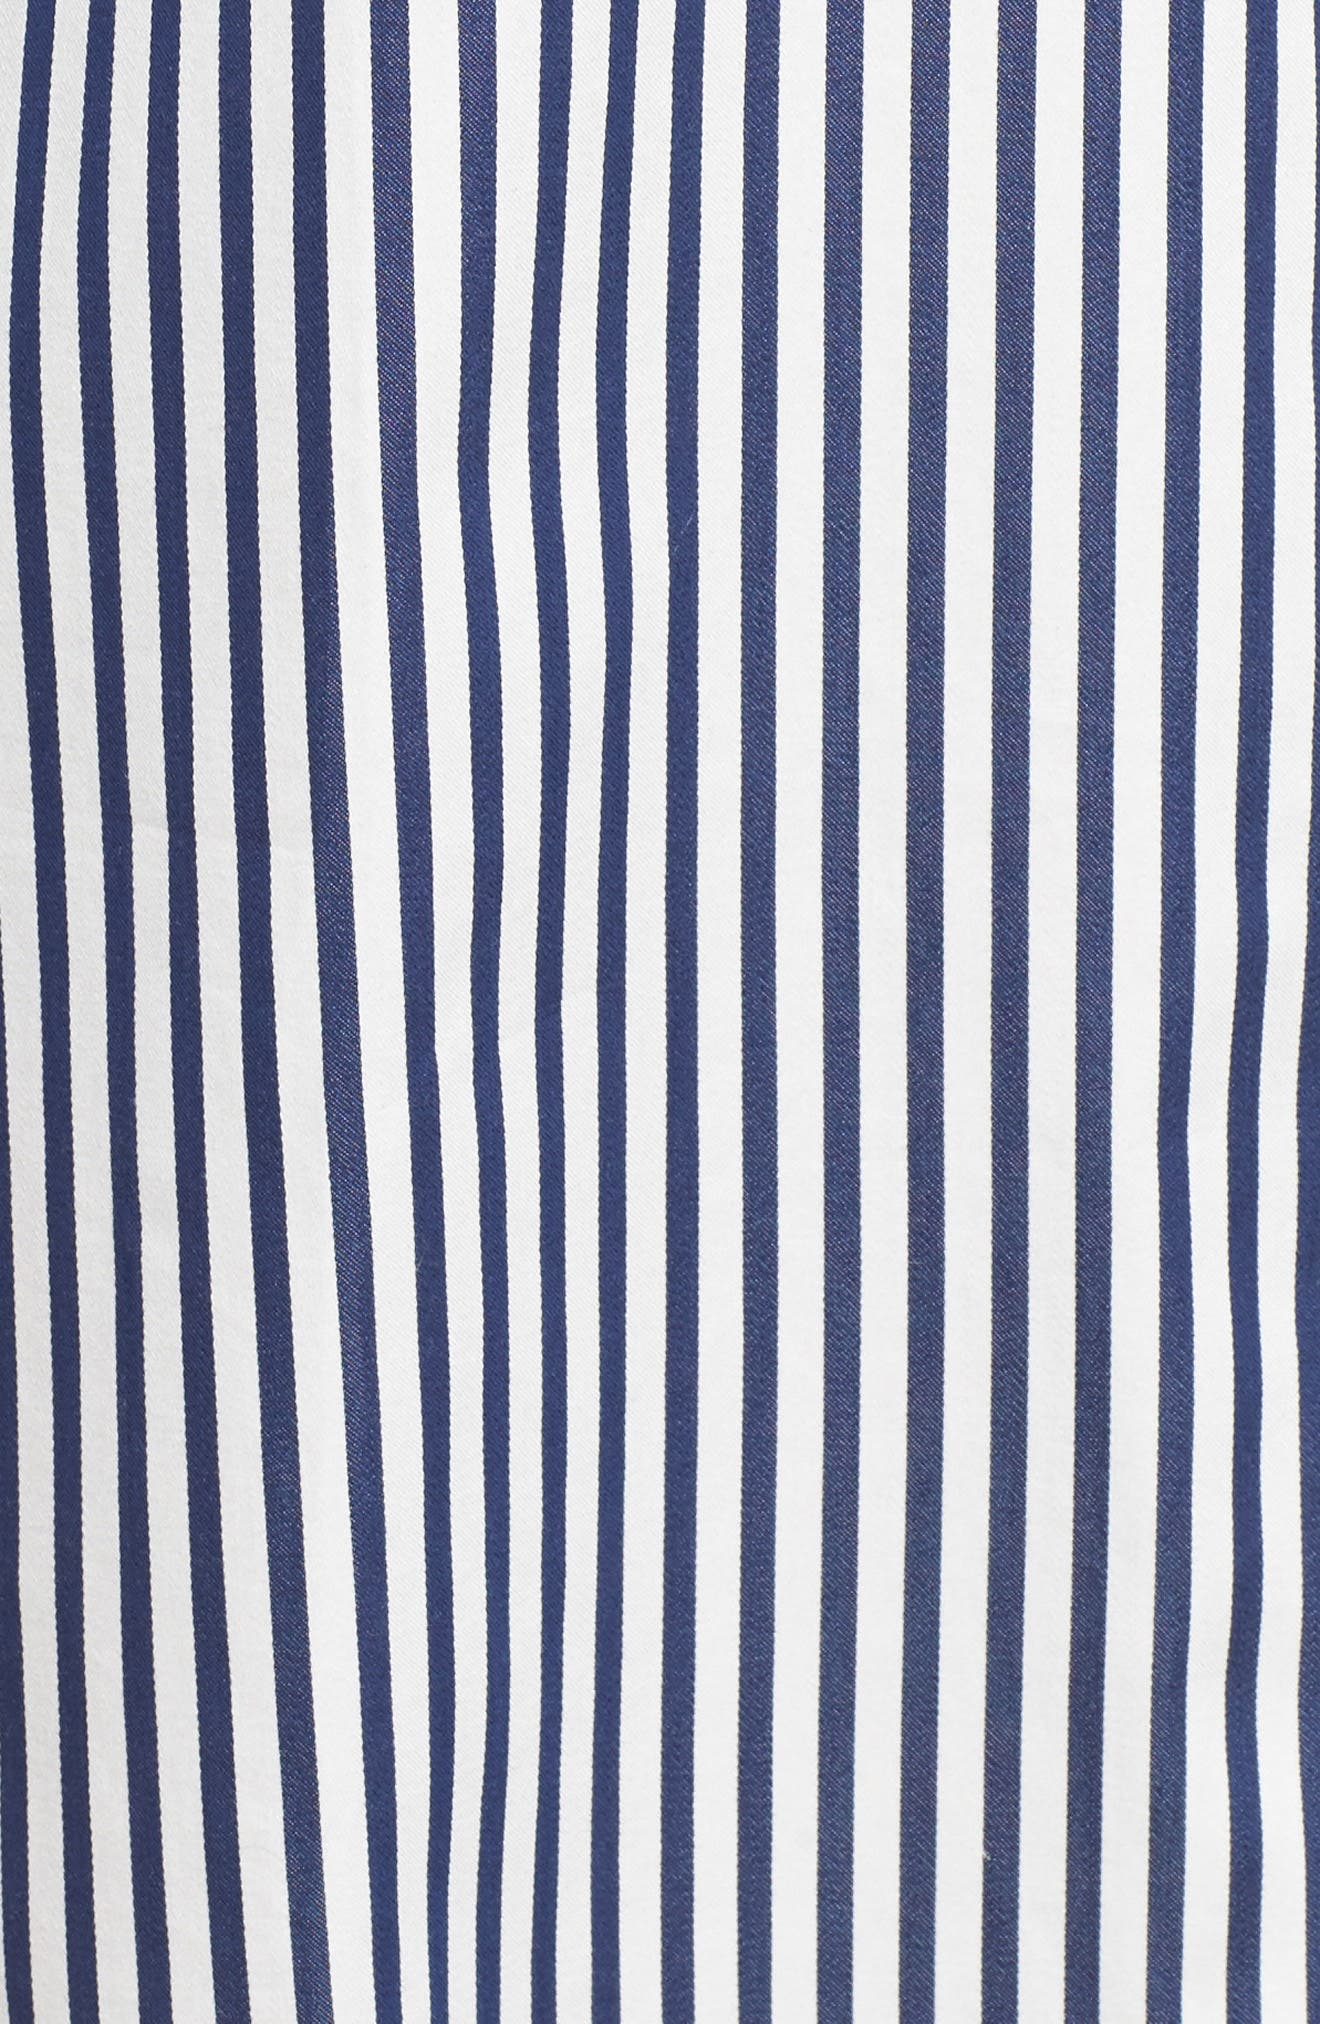 stripe sleep shirt,                             Alternate thumbnail 5, color,                             Navy Stripe